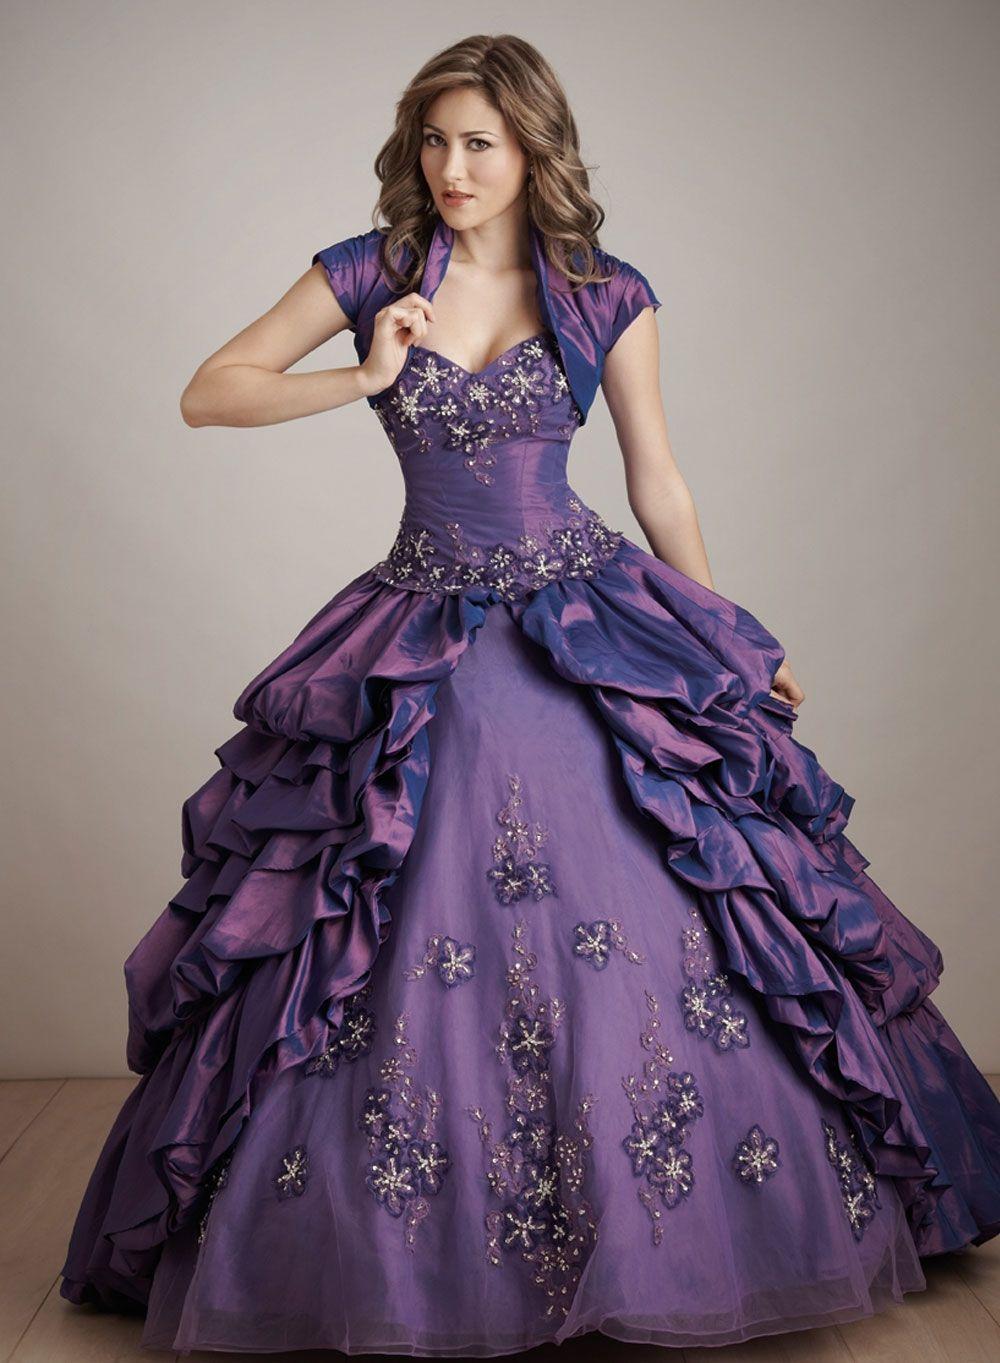 Vestidos de 15 color morado. | 15 anos | Pinterest | Vestidos de ...